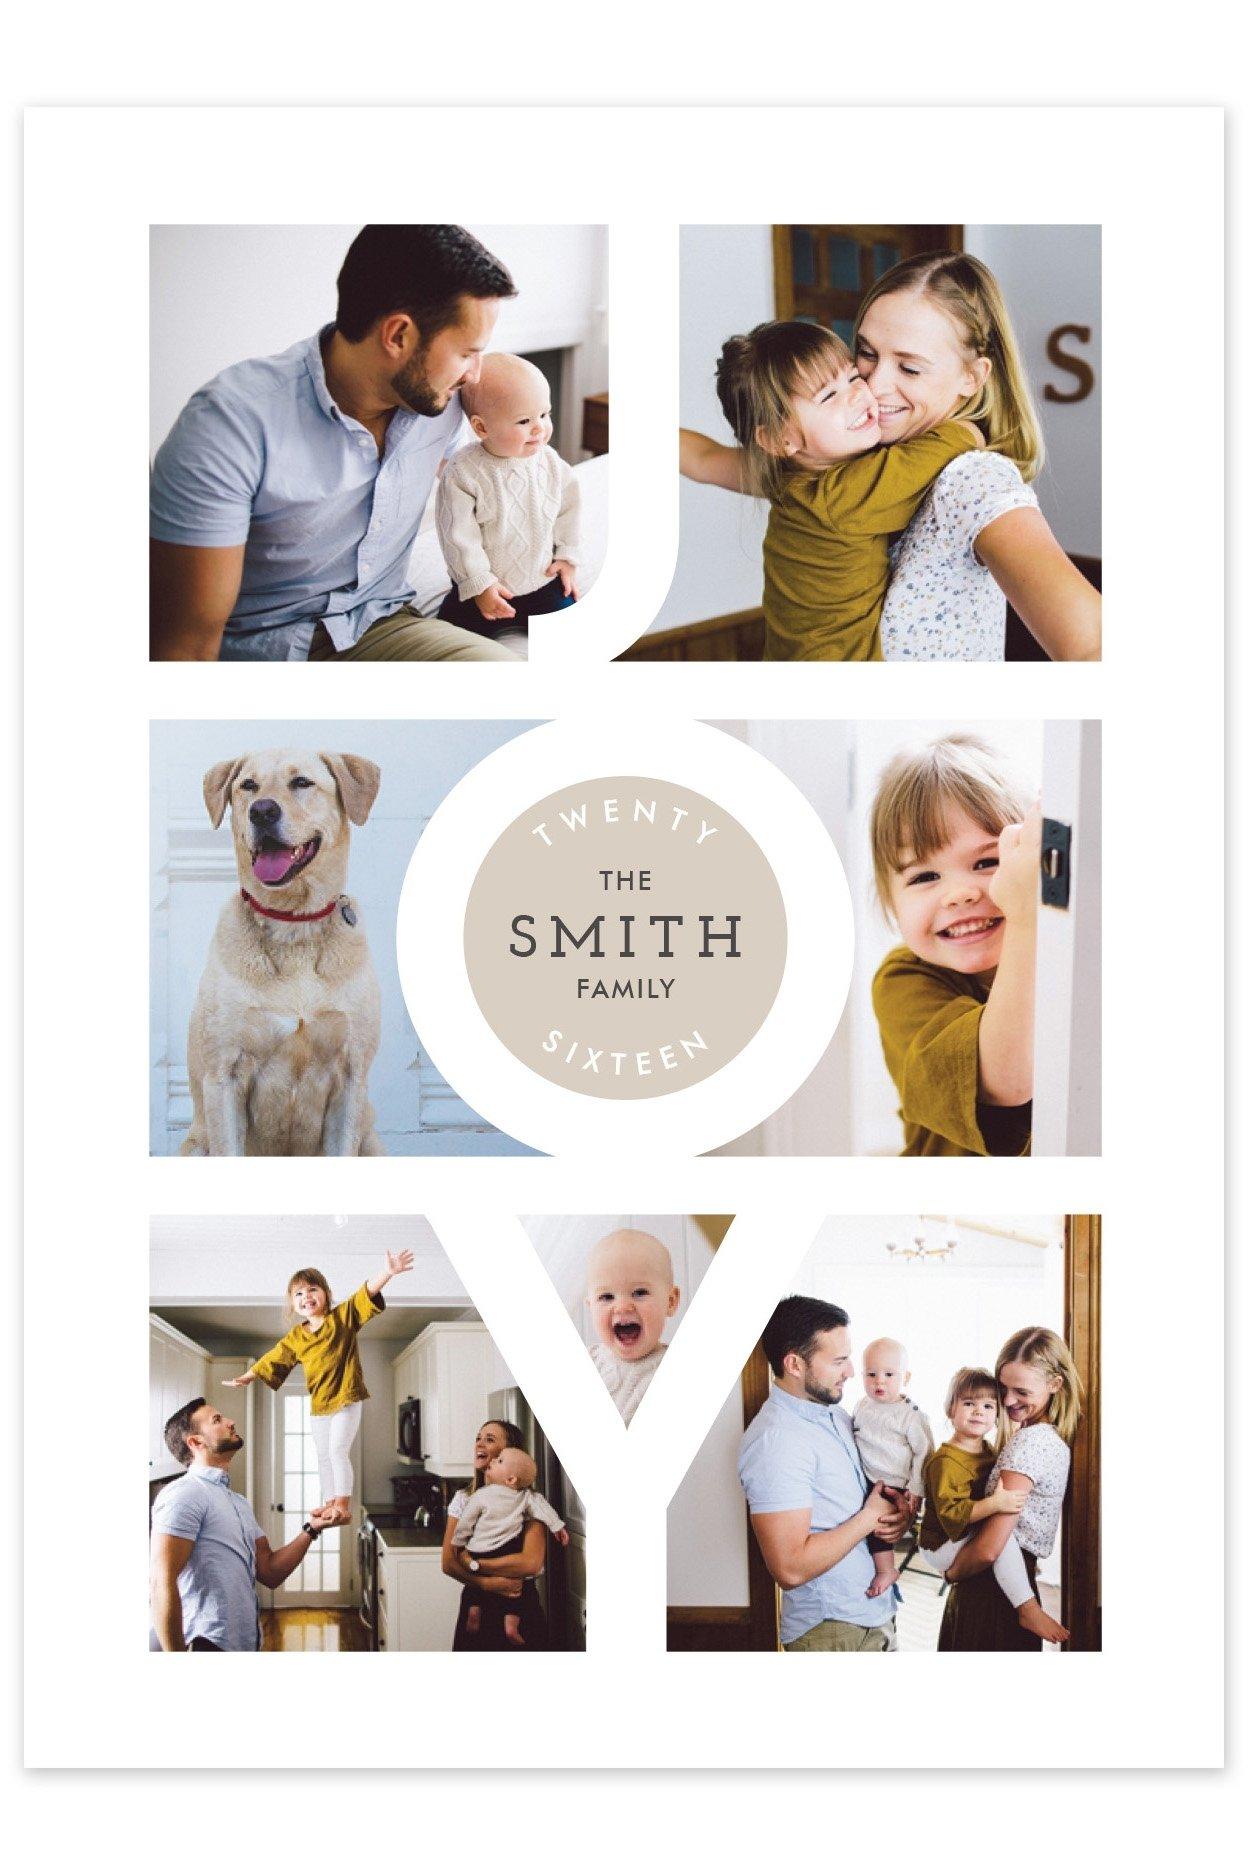 10 Fashionable Family Christmas Card Photo Ideas